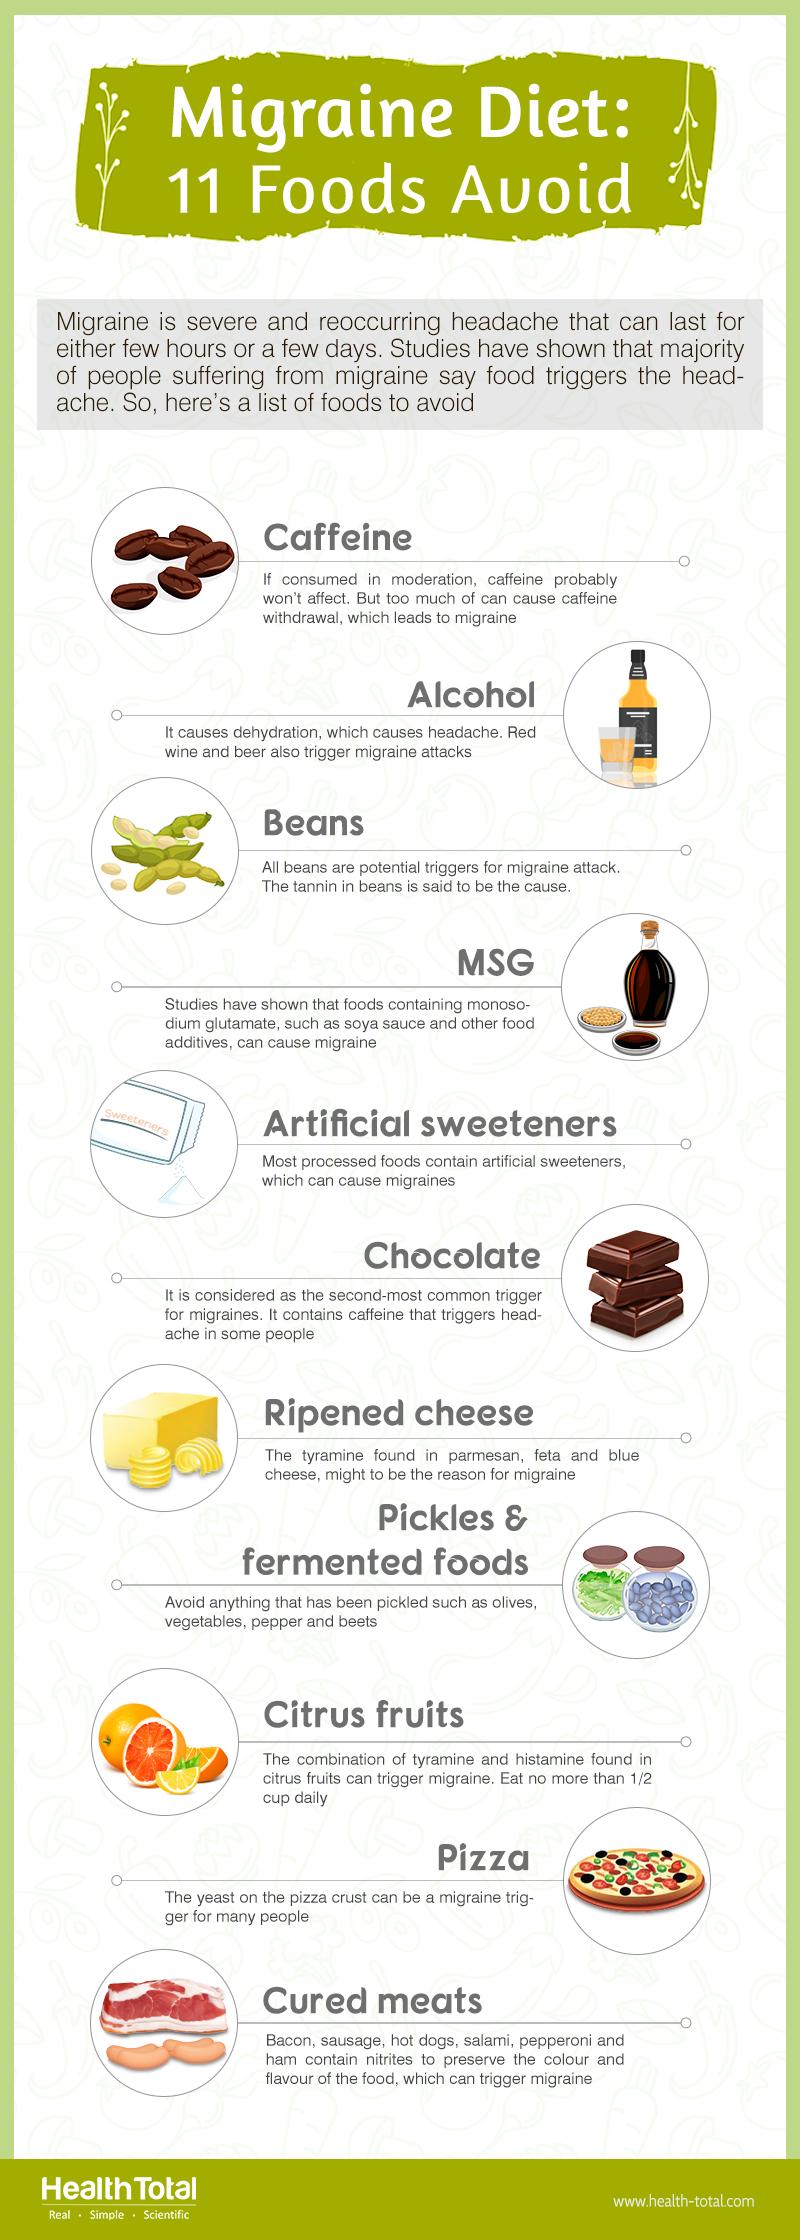 foods to avoid in migraine